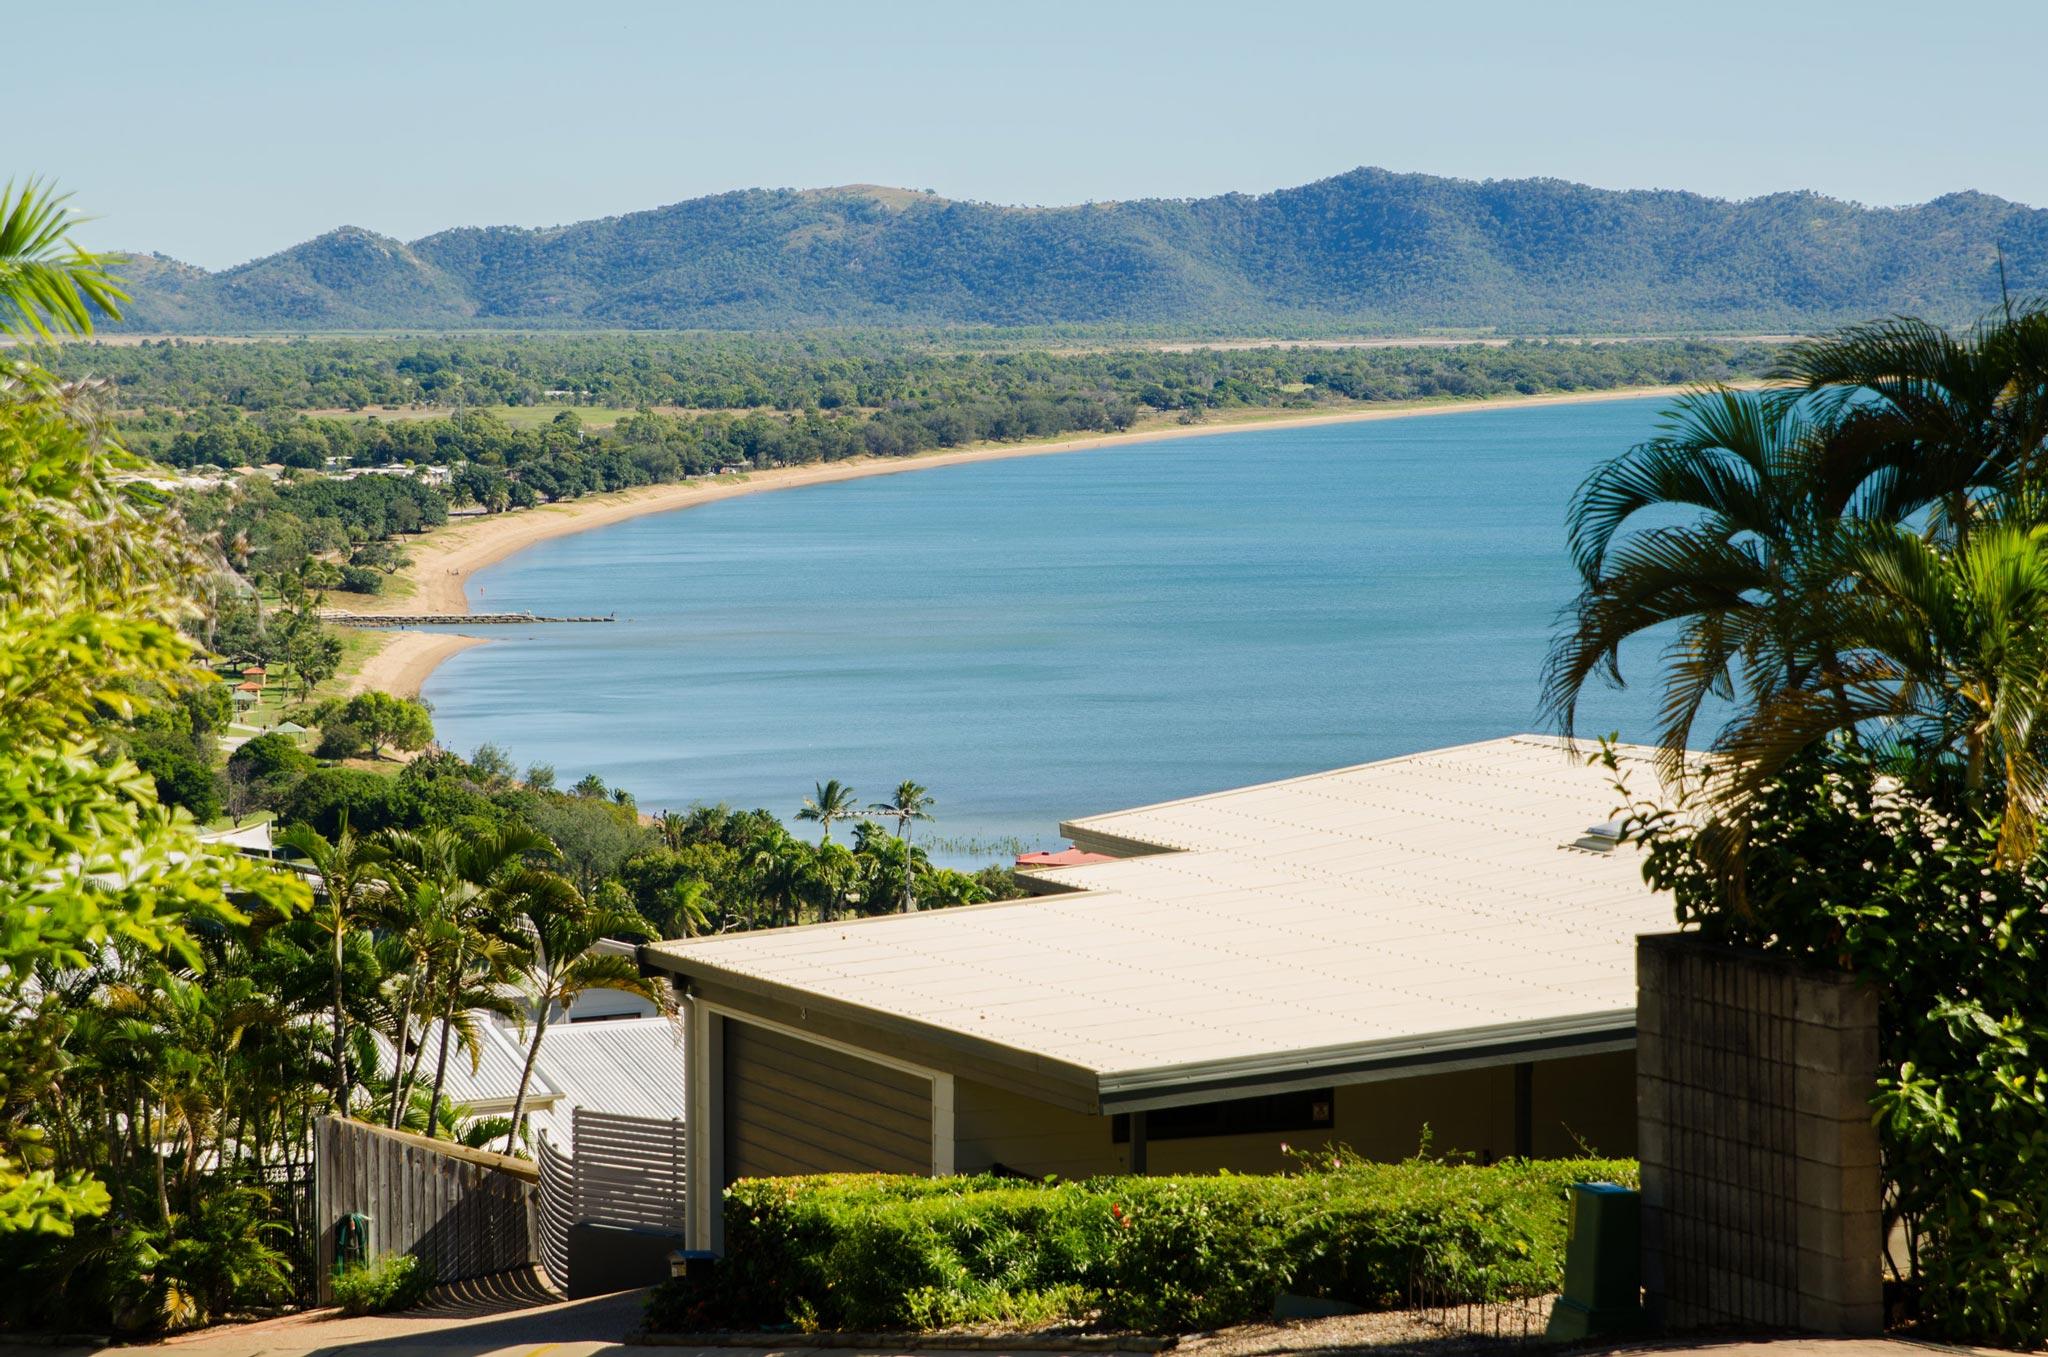 Paesaggi-Australia - DSC 0303 - Spiagge Australiane - Spiagge Australiane